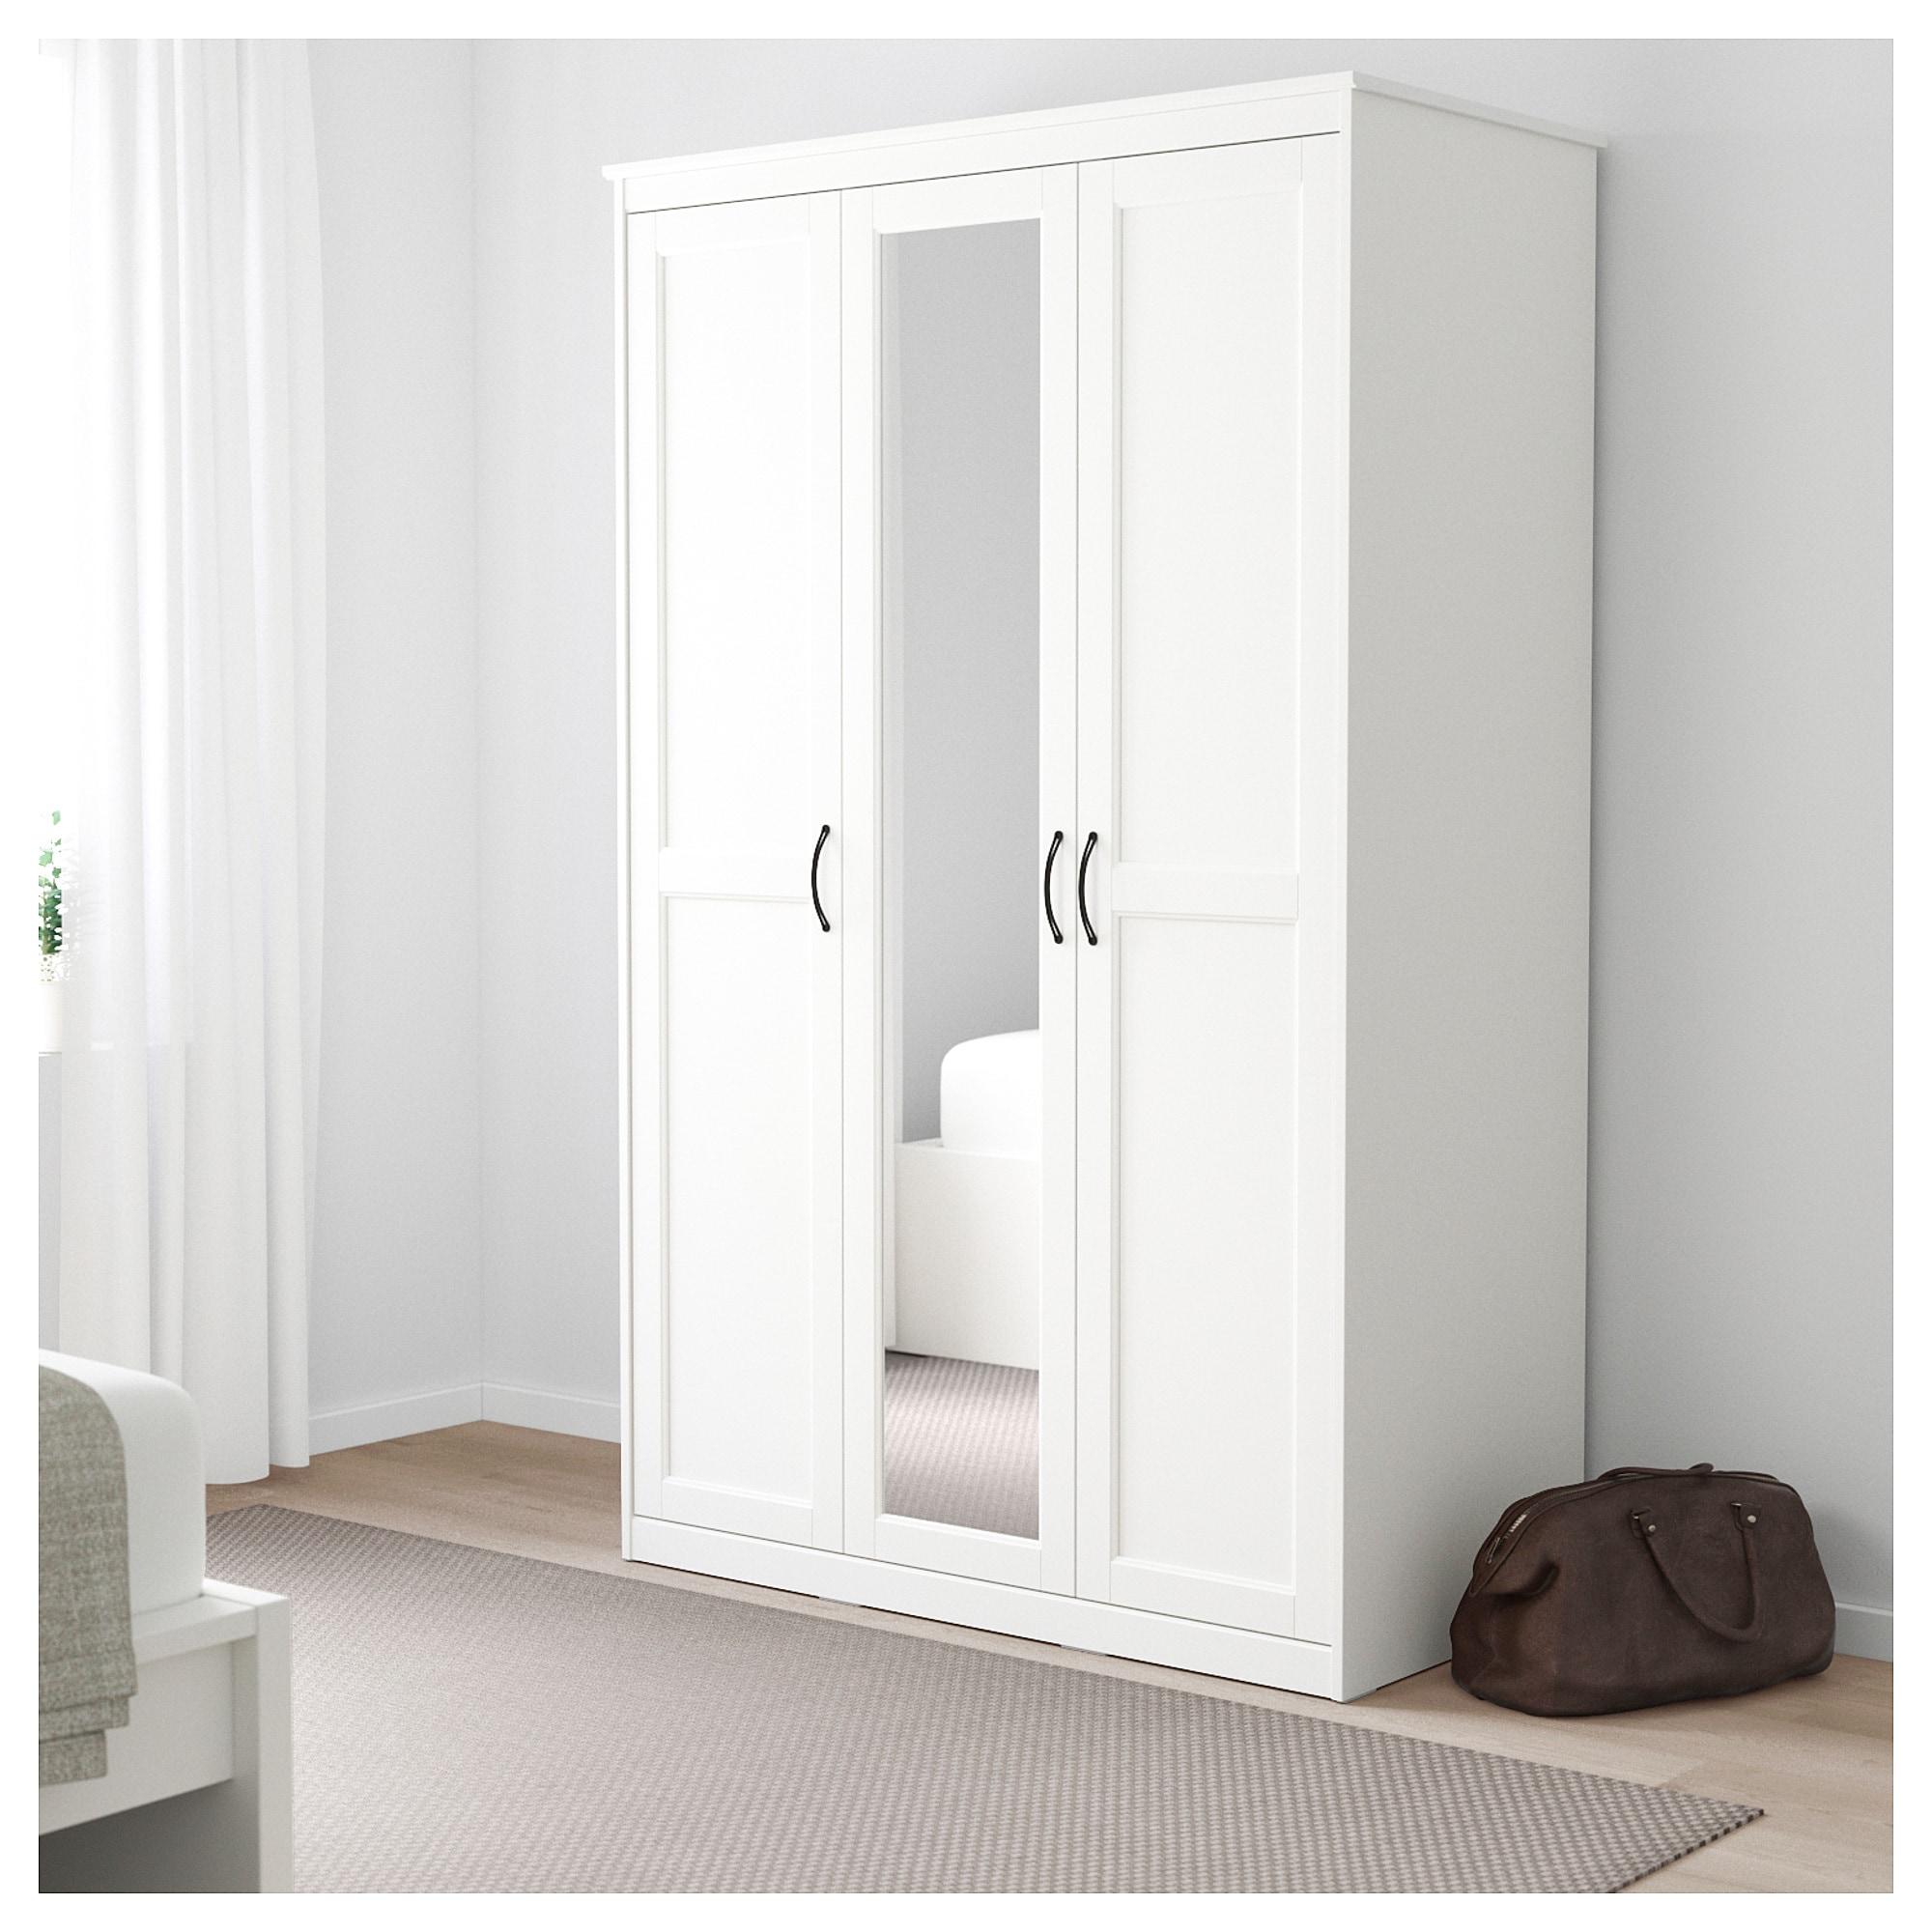 SONGESAND Wardrobe - white - IKEA